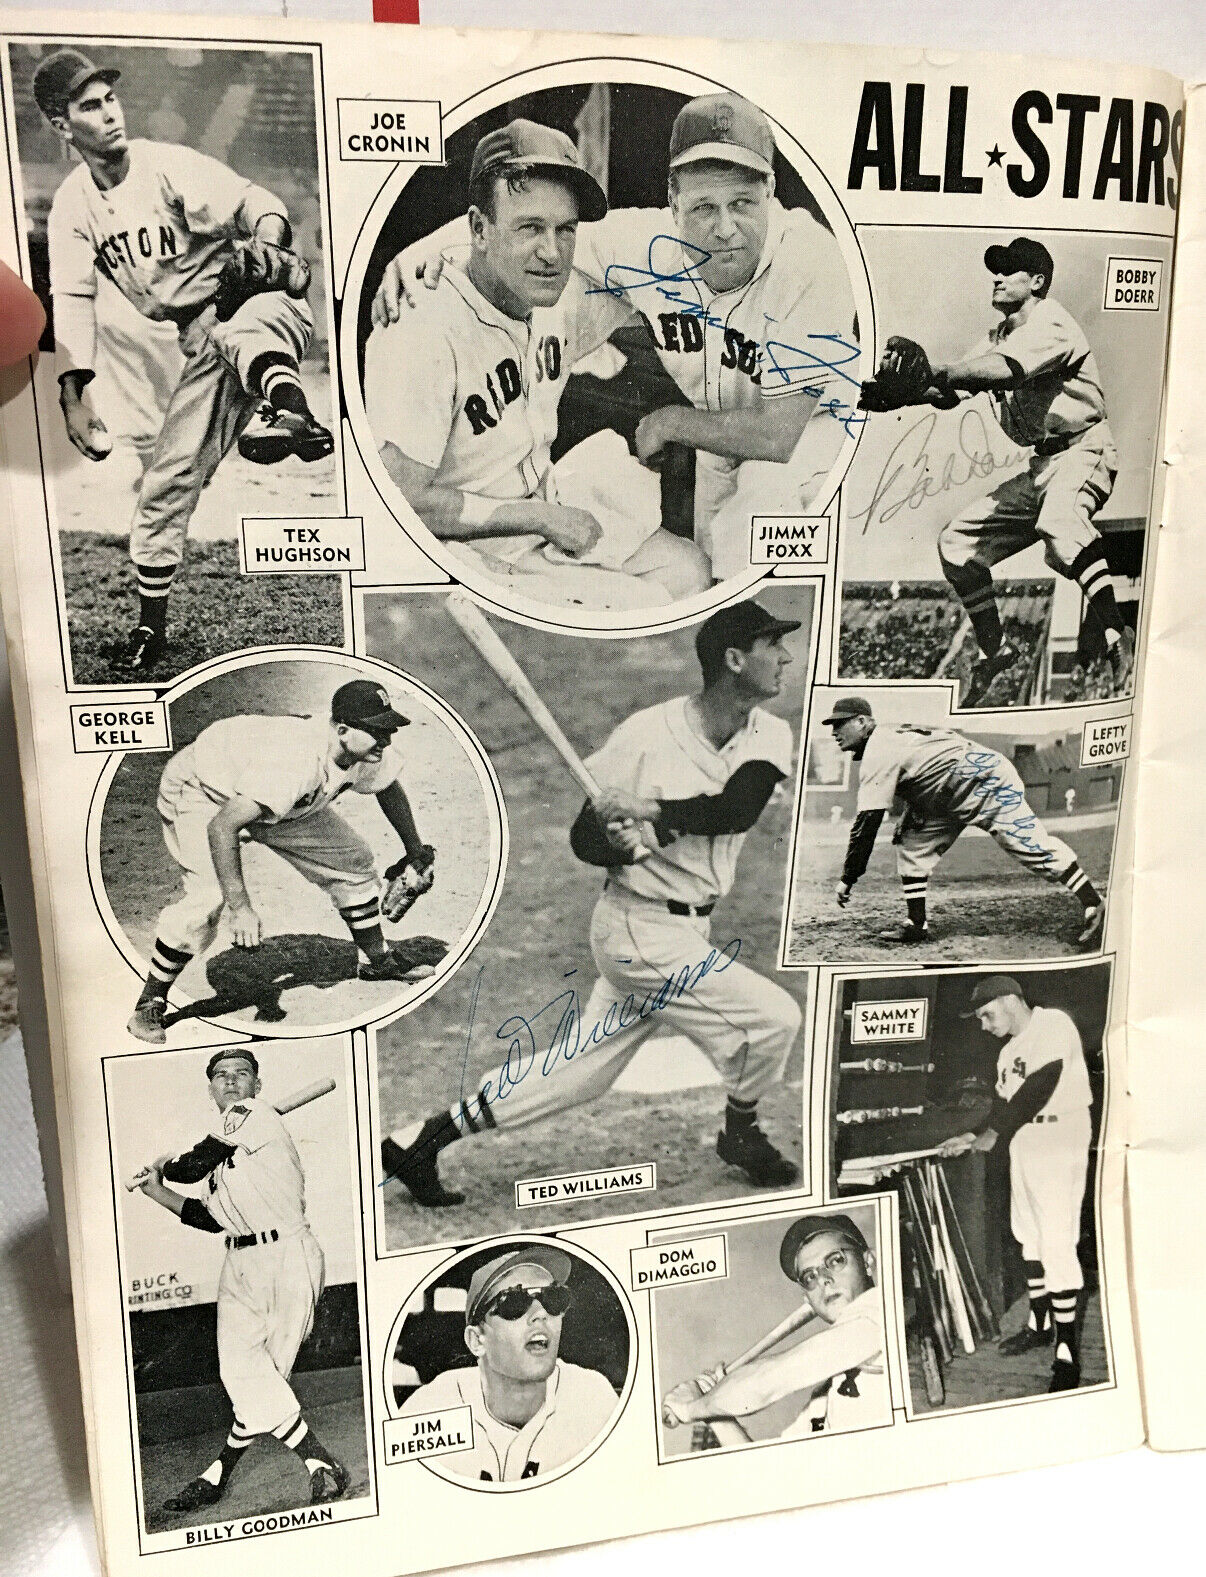 Red Sox Jimmie Foxx--Williams--Lefty Grove--Doerr vintage signed banquet program